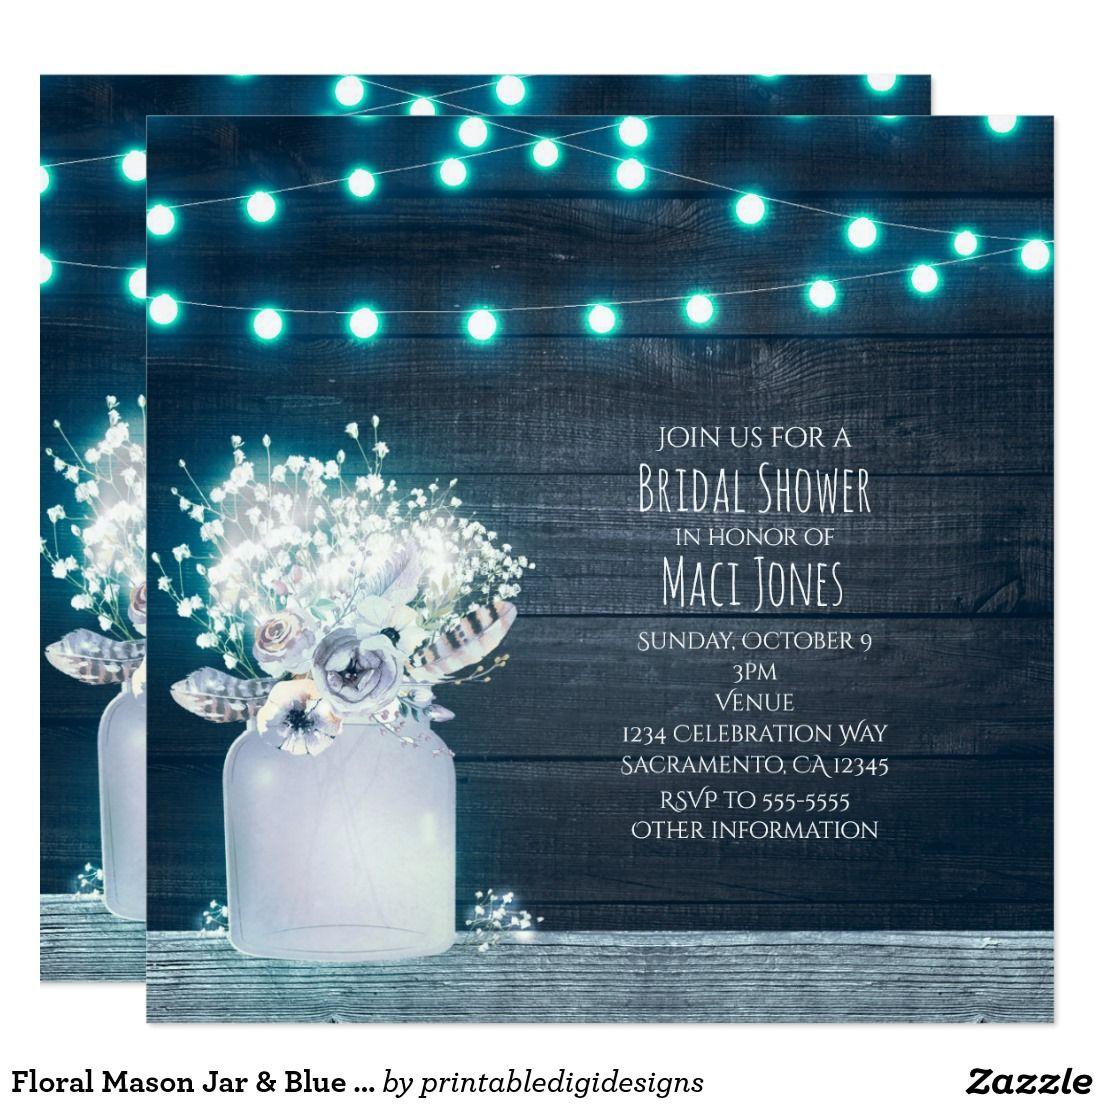 Floral Mason Jar & Blue Lights Rustic Invitations